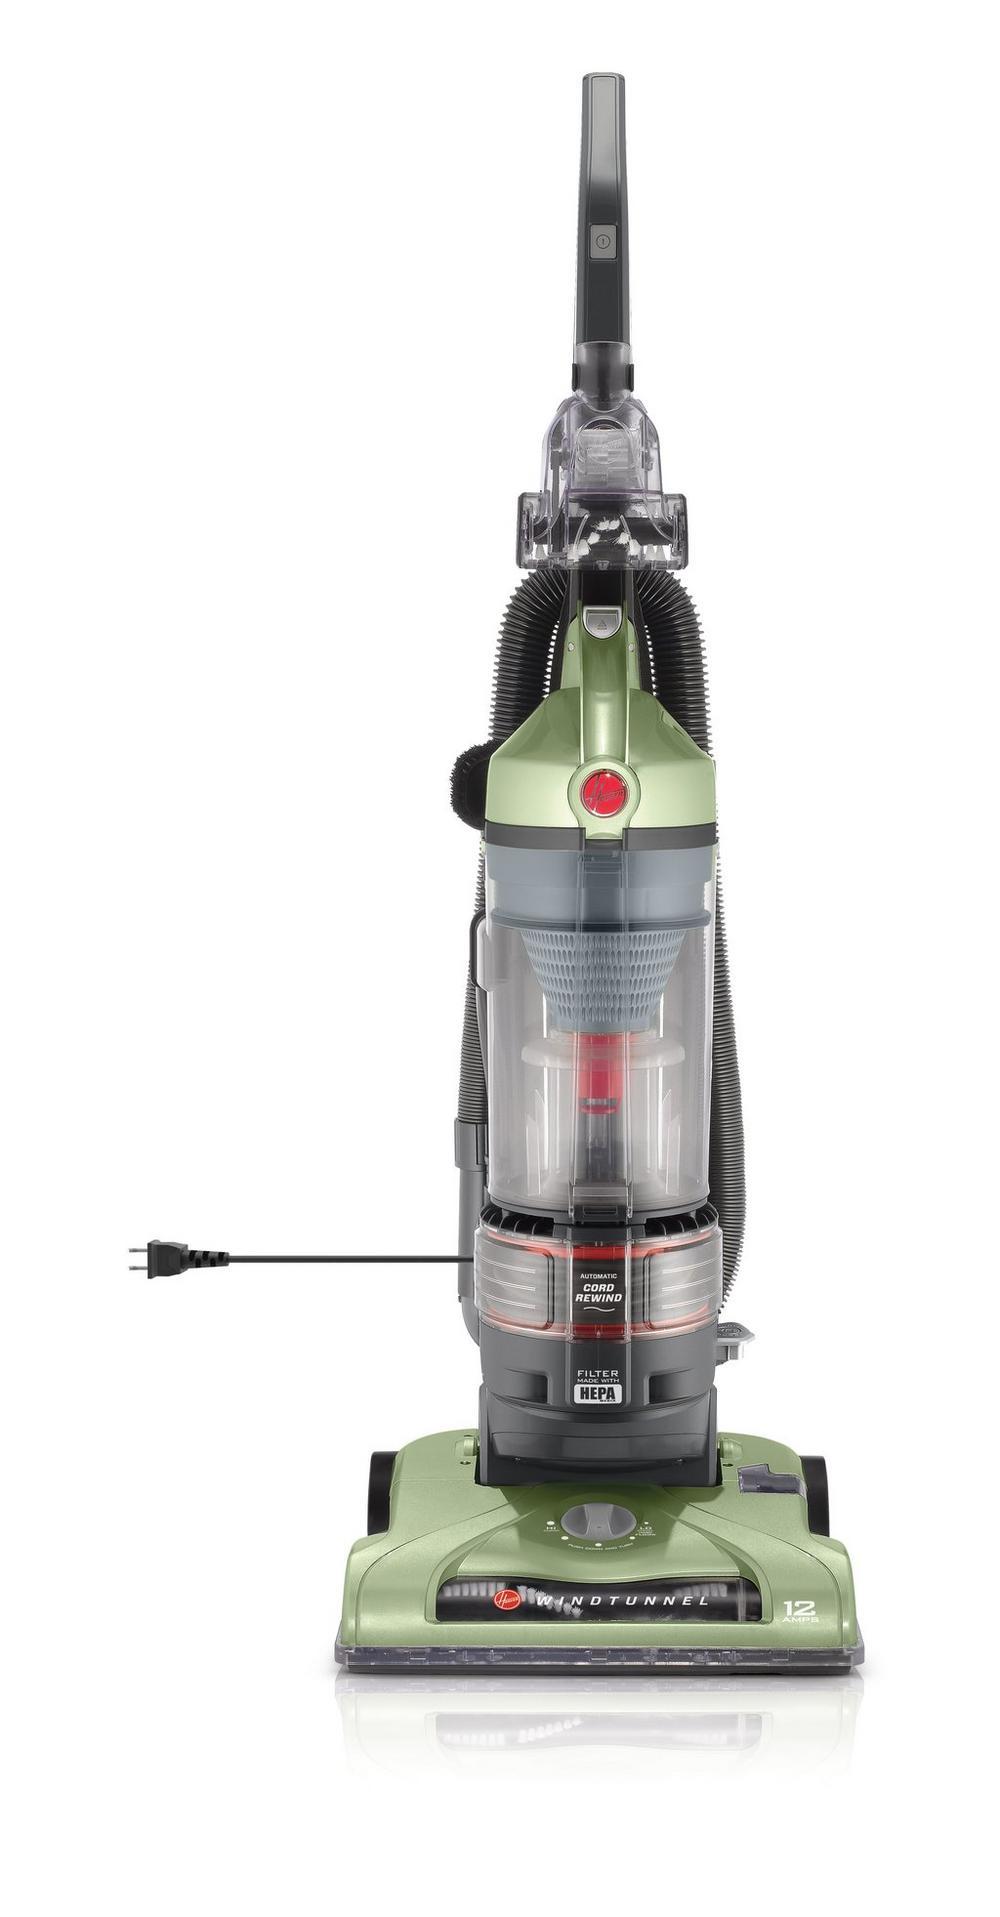 WindTunnel T-Series Rewind Plus Upright Vacuum1